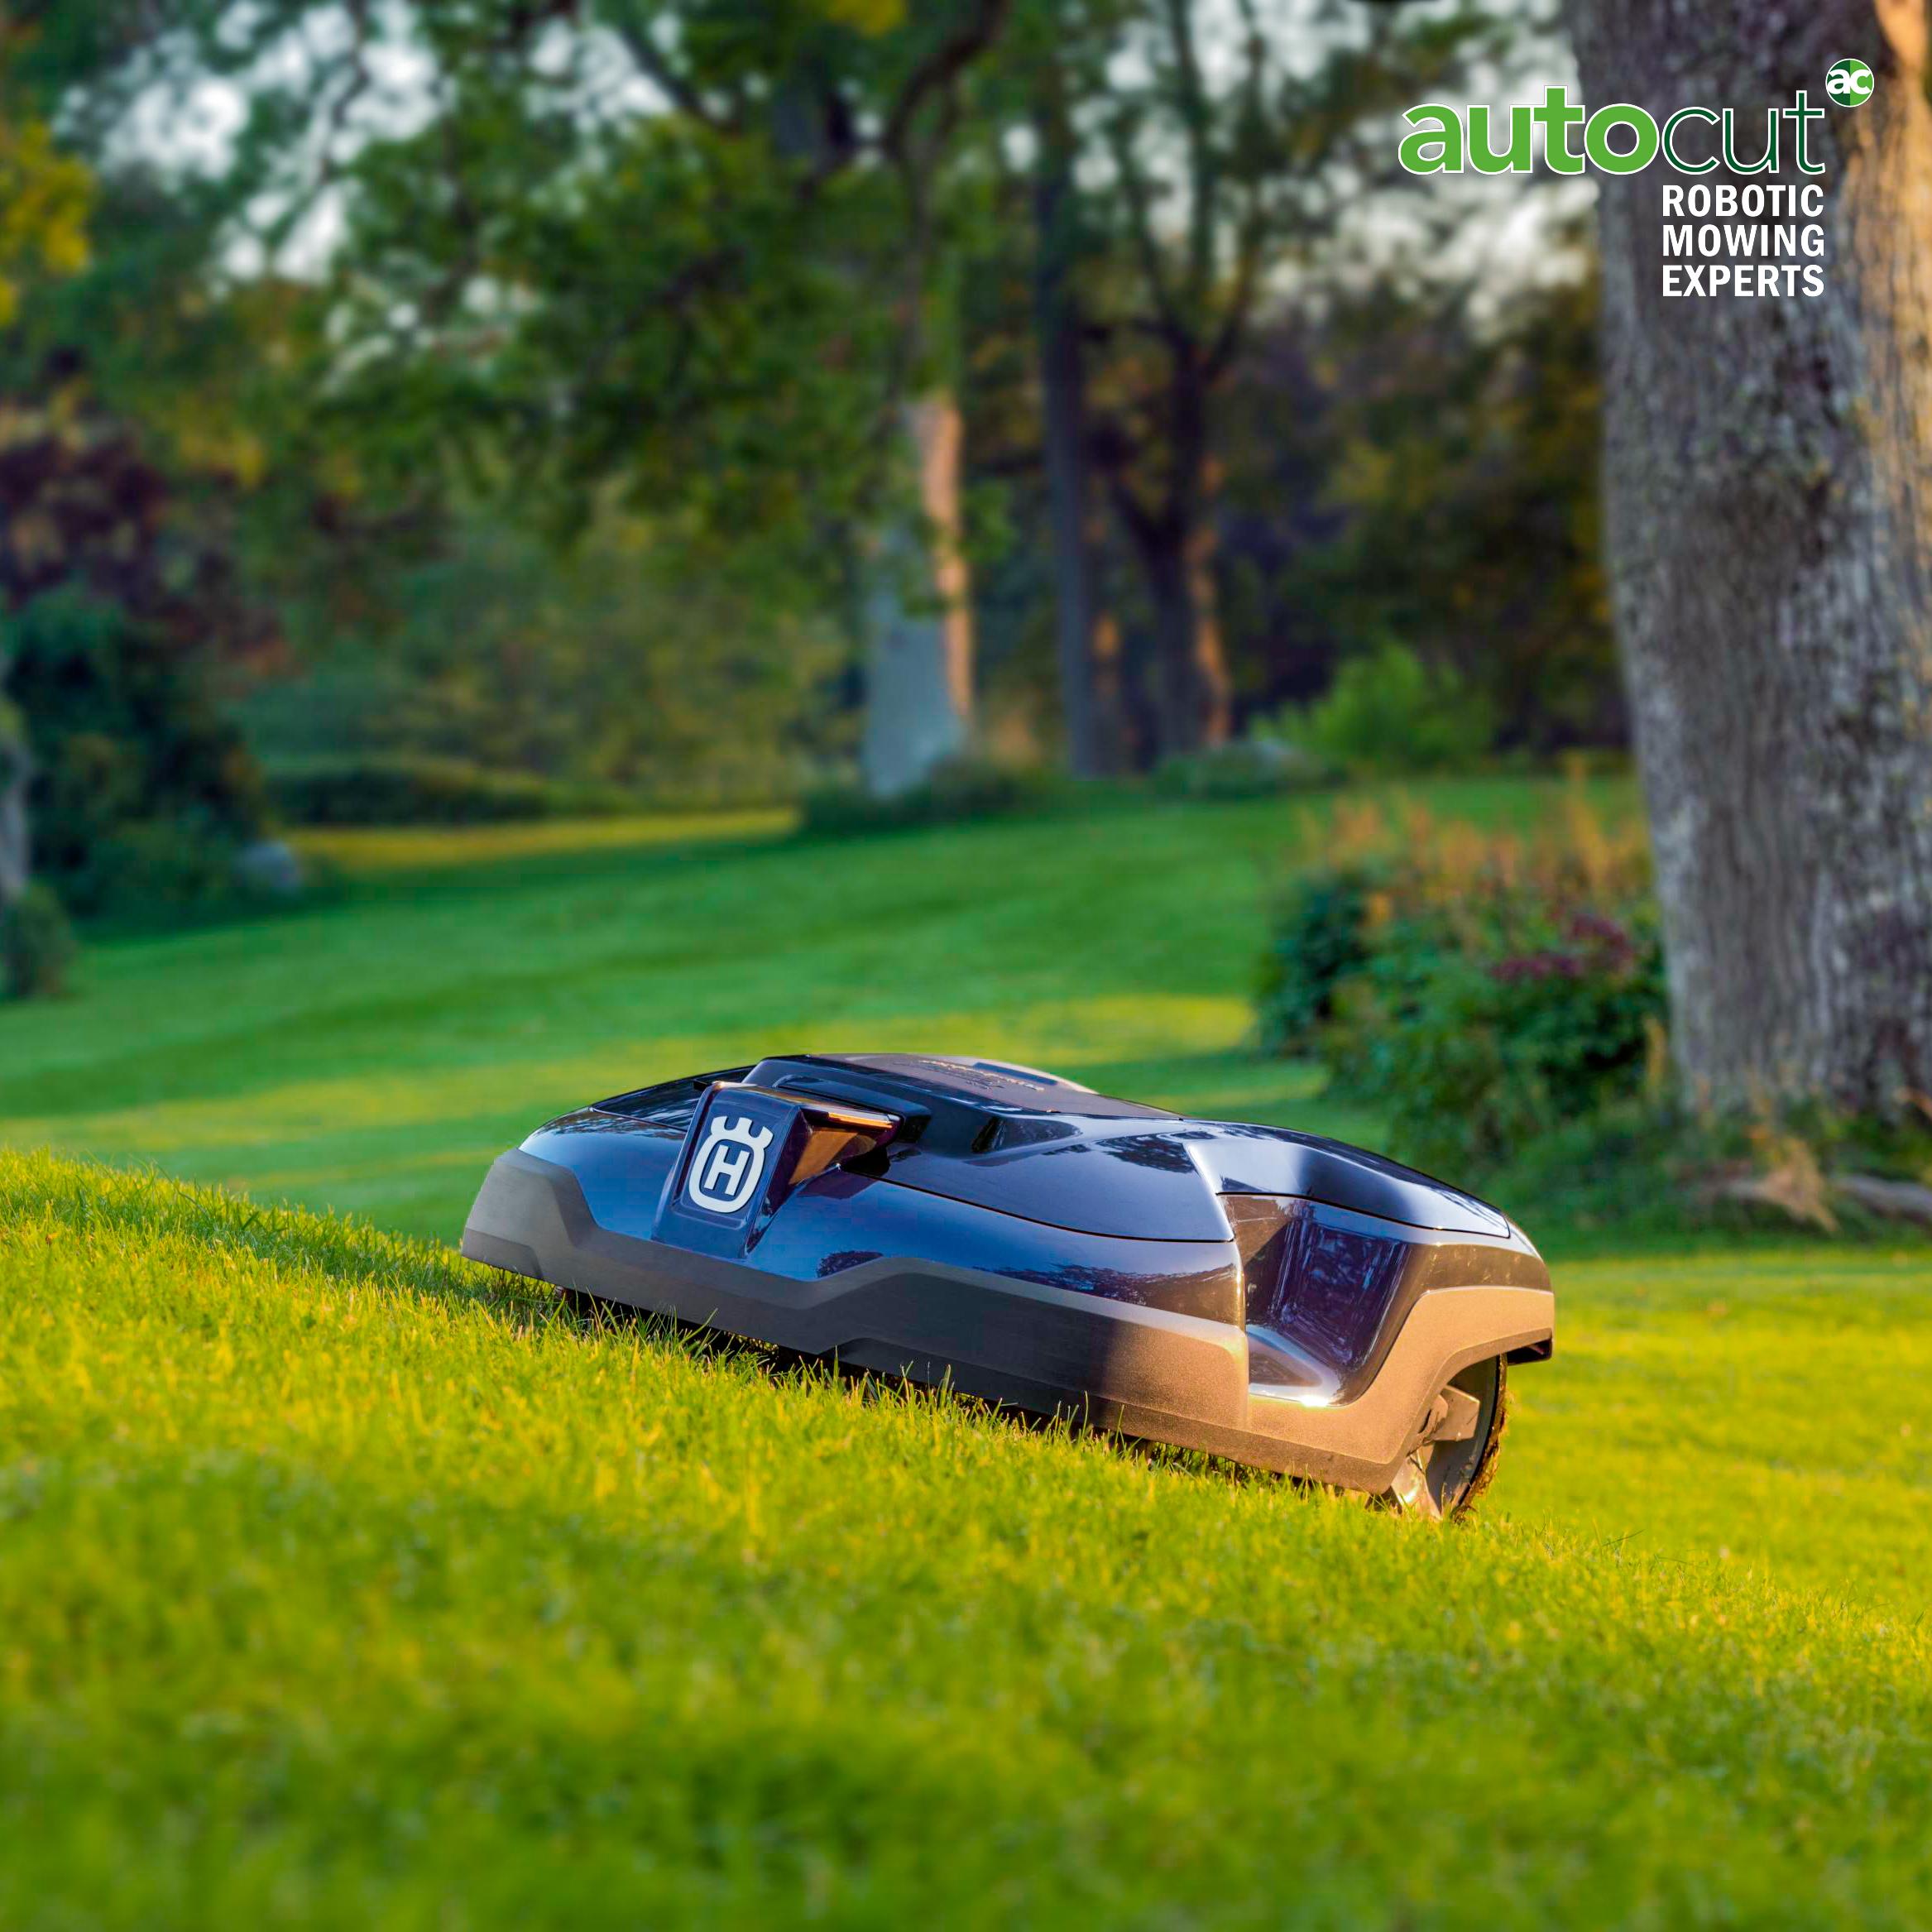 Meet the Mower: Automower® 310